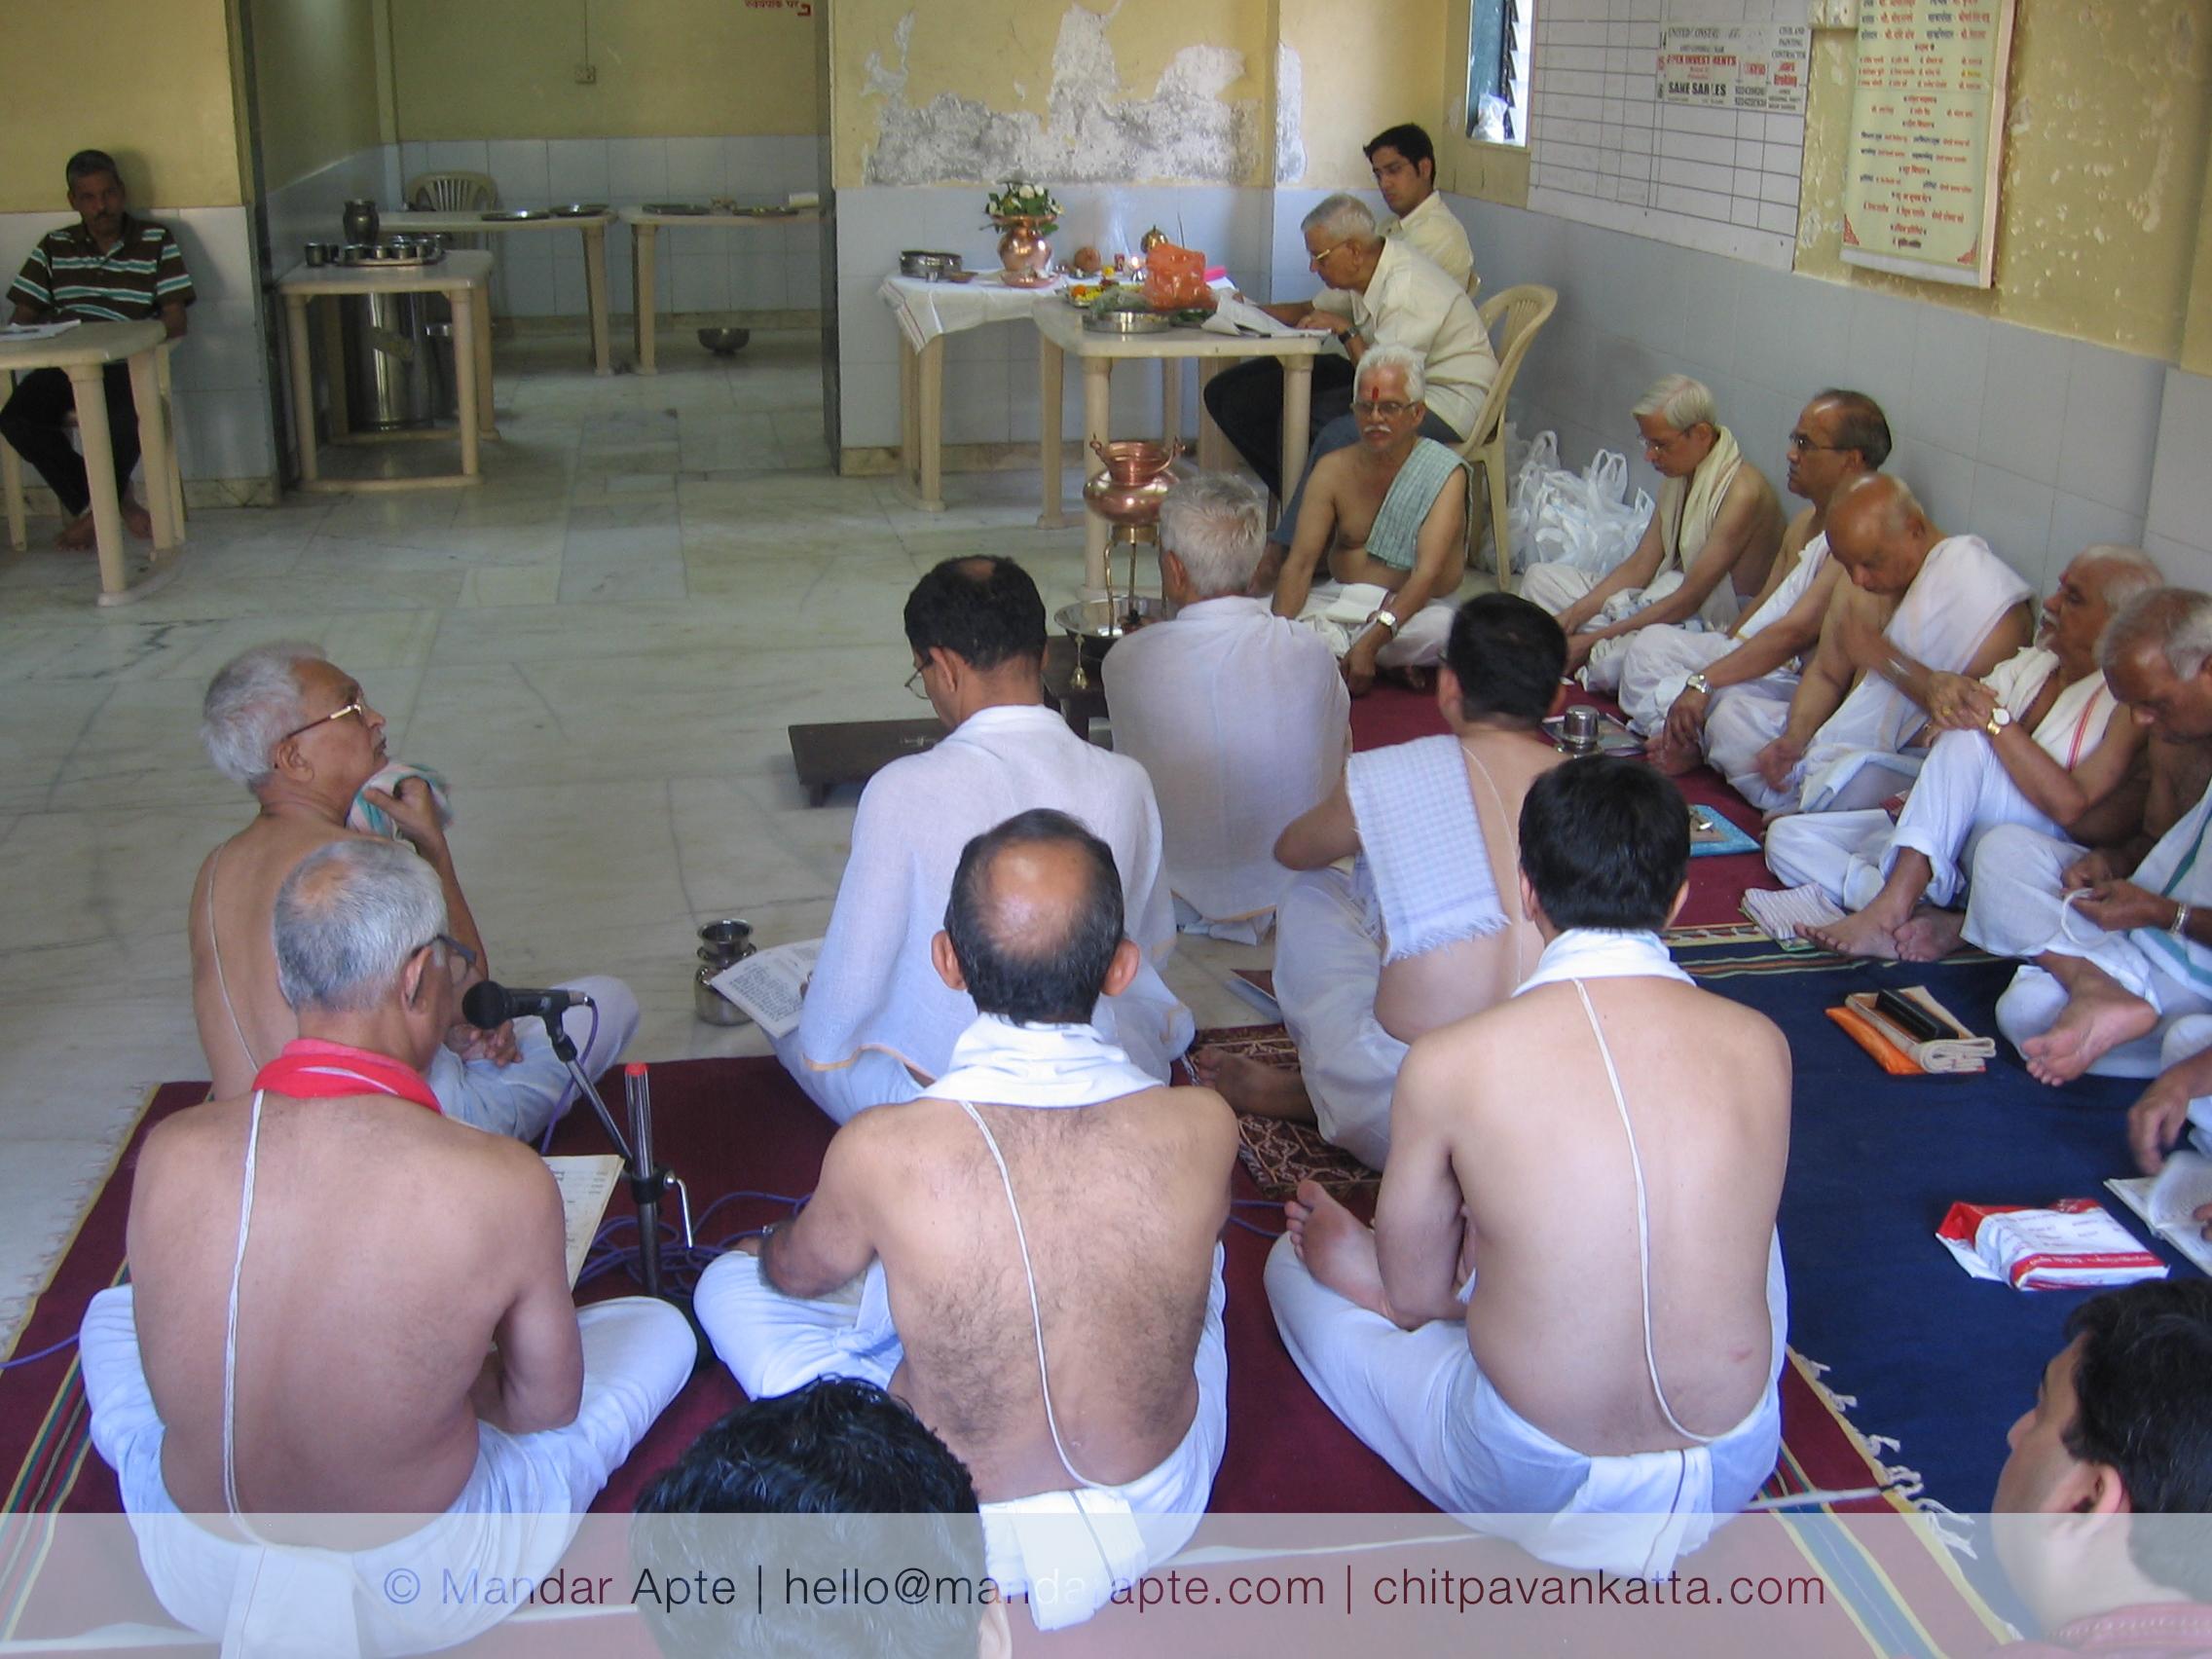 Mahashivaratri at Chitpavan Sangha Mulund 10th March 2013 05